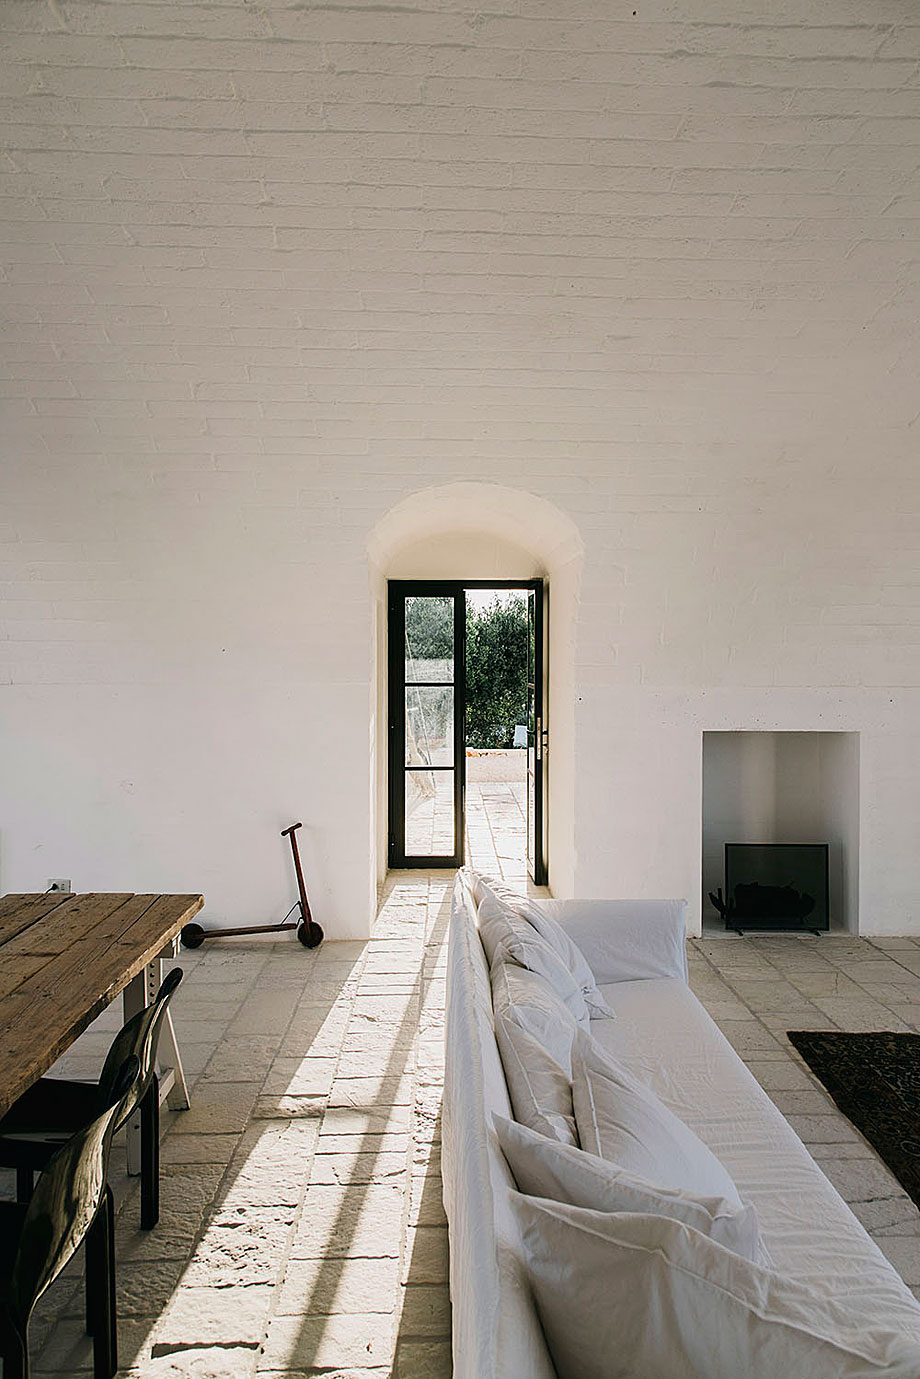 masseria-moroseta-andrew-trotter-architecture-puglia-ostuni-openhouse-10